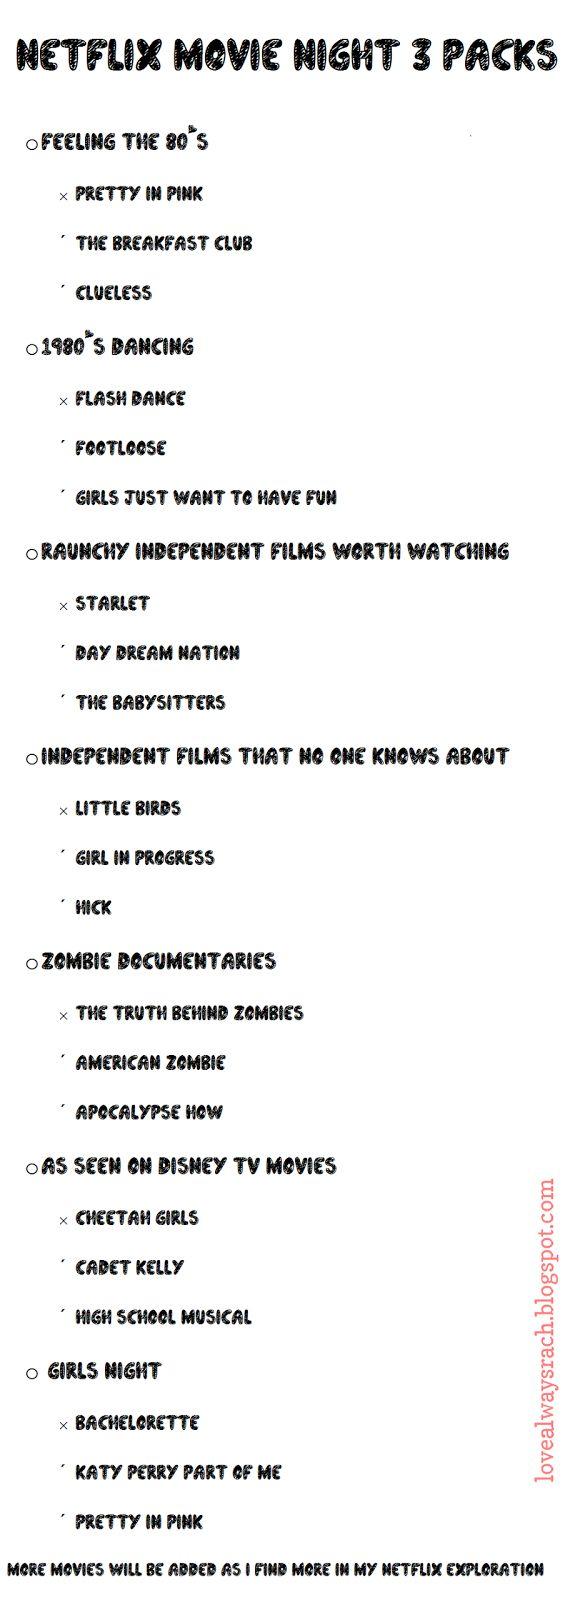 Love Always, Rach: Neflix Movie Night 3 Packs